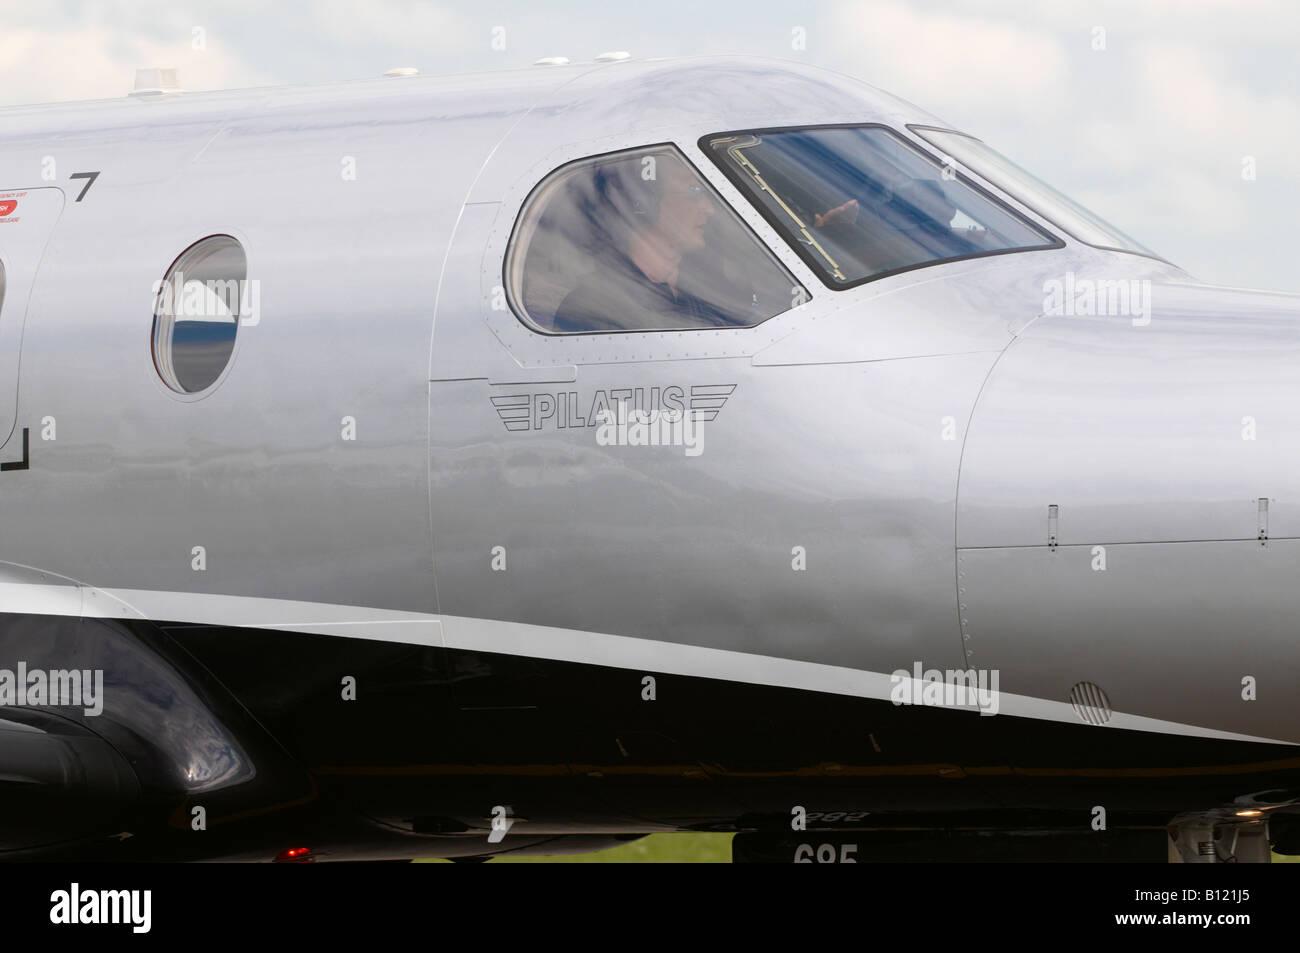 Pilatus PC-12 Duxford Spring Air Show 2008 Taxiing Pilot wearing Bose head phones - Stock Image